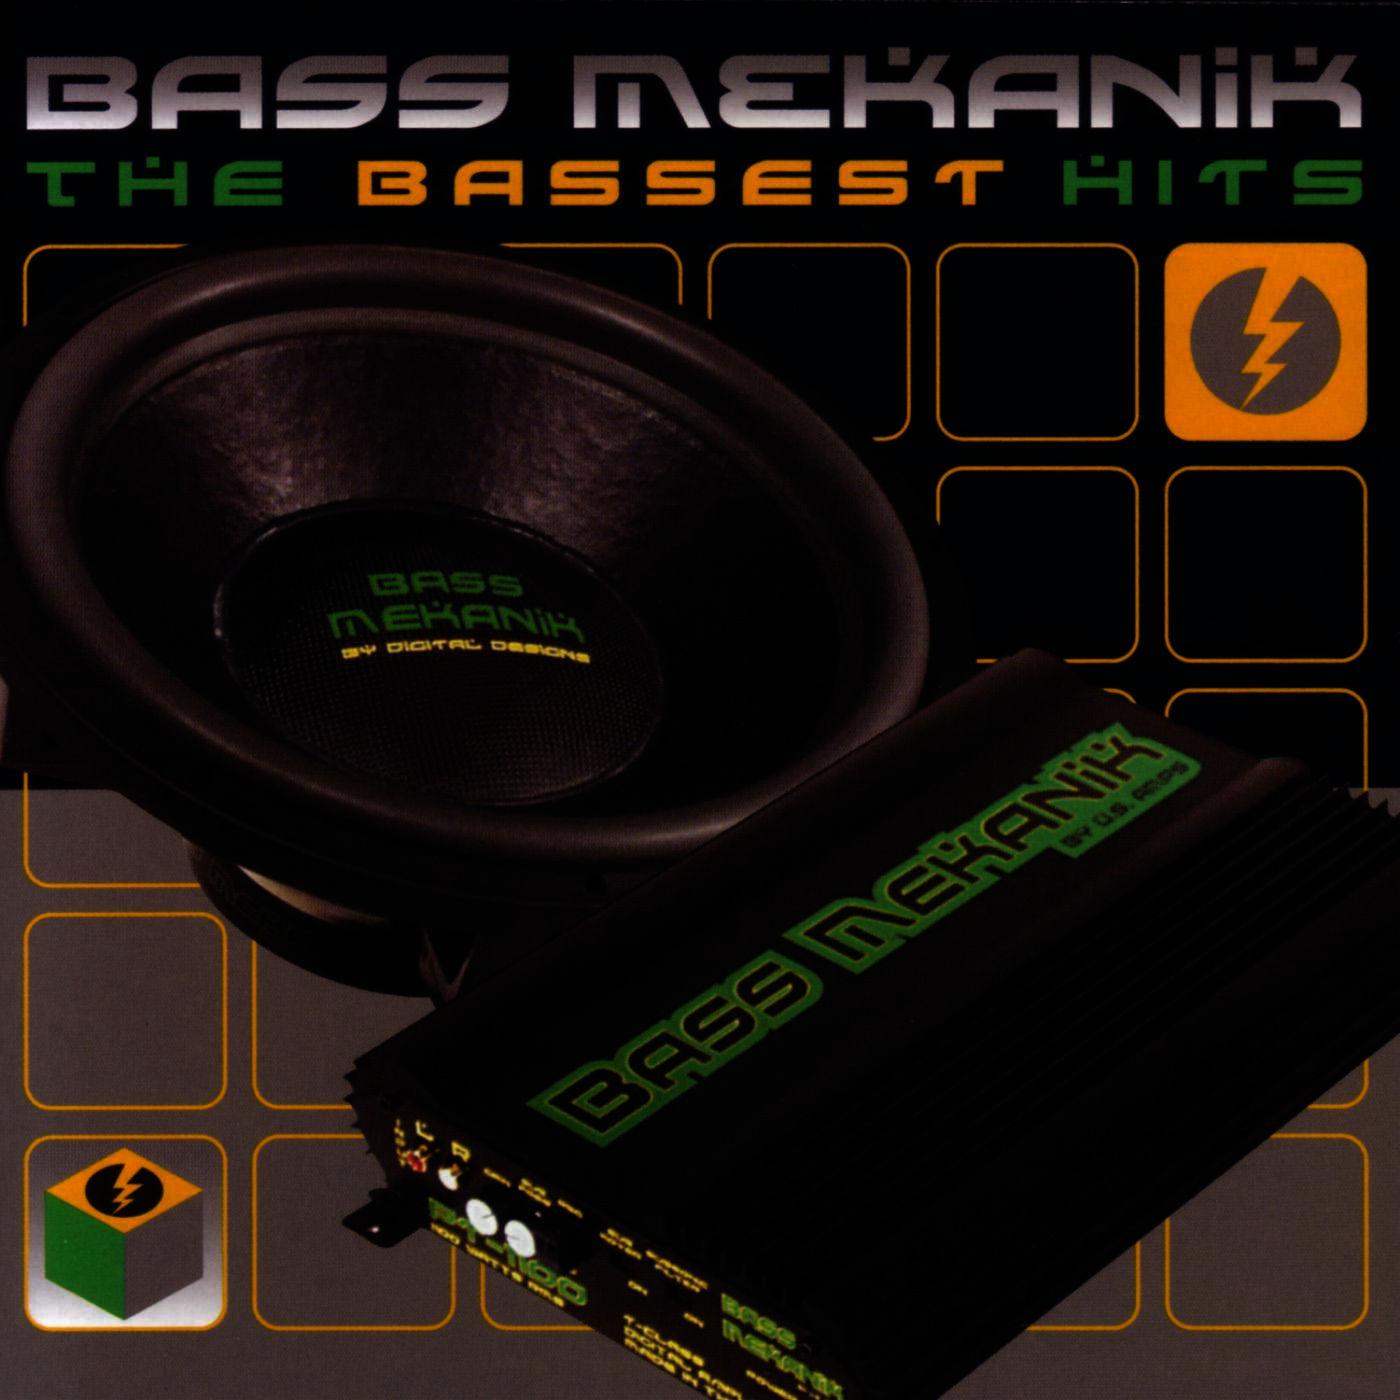 cd bass mekanik